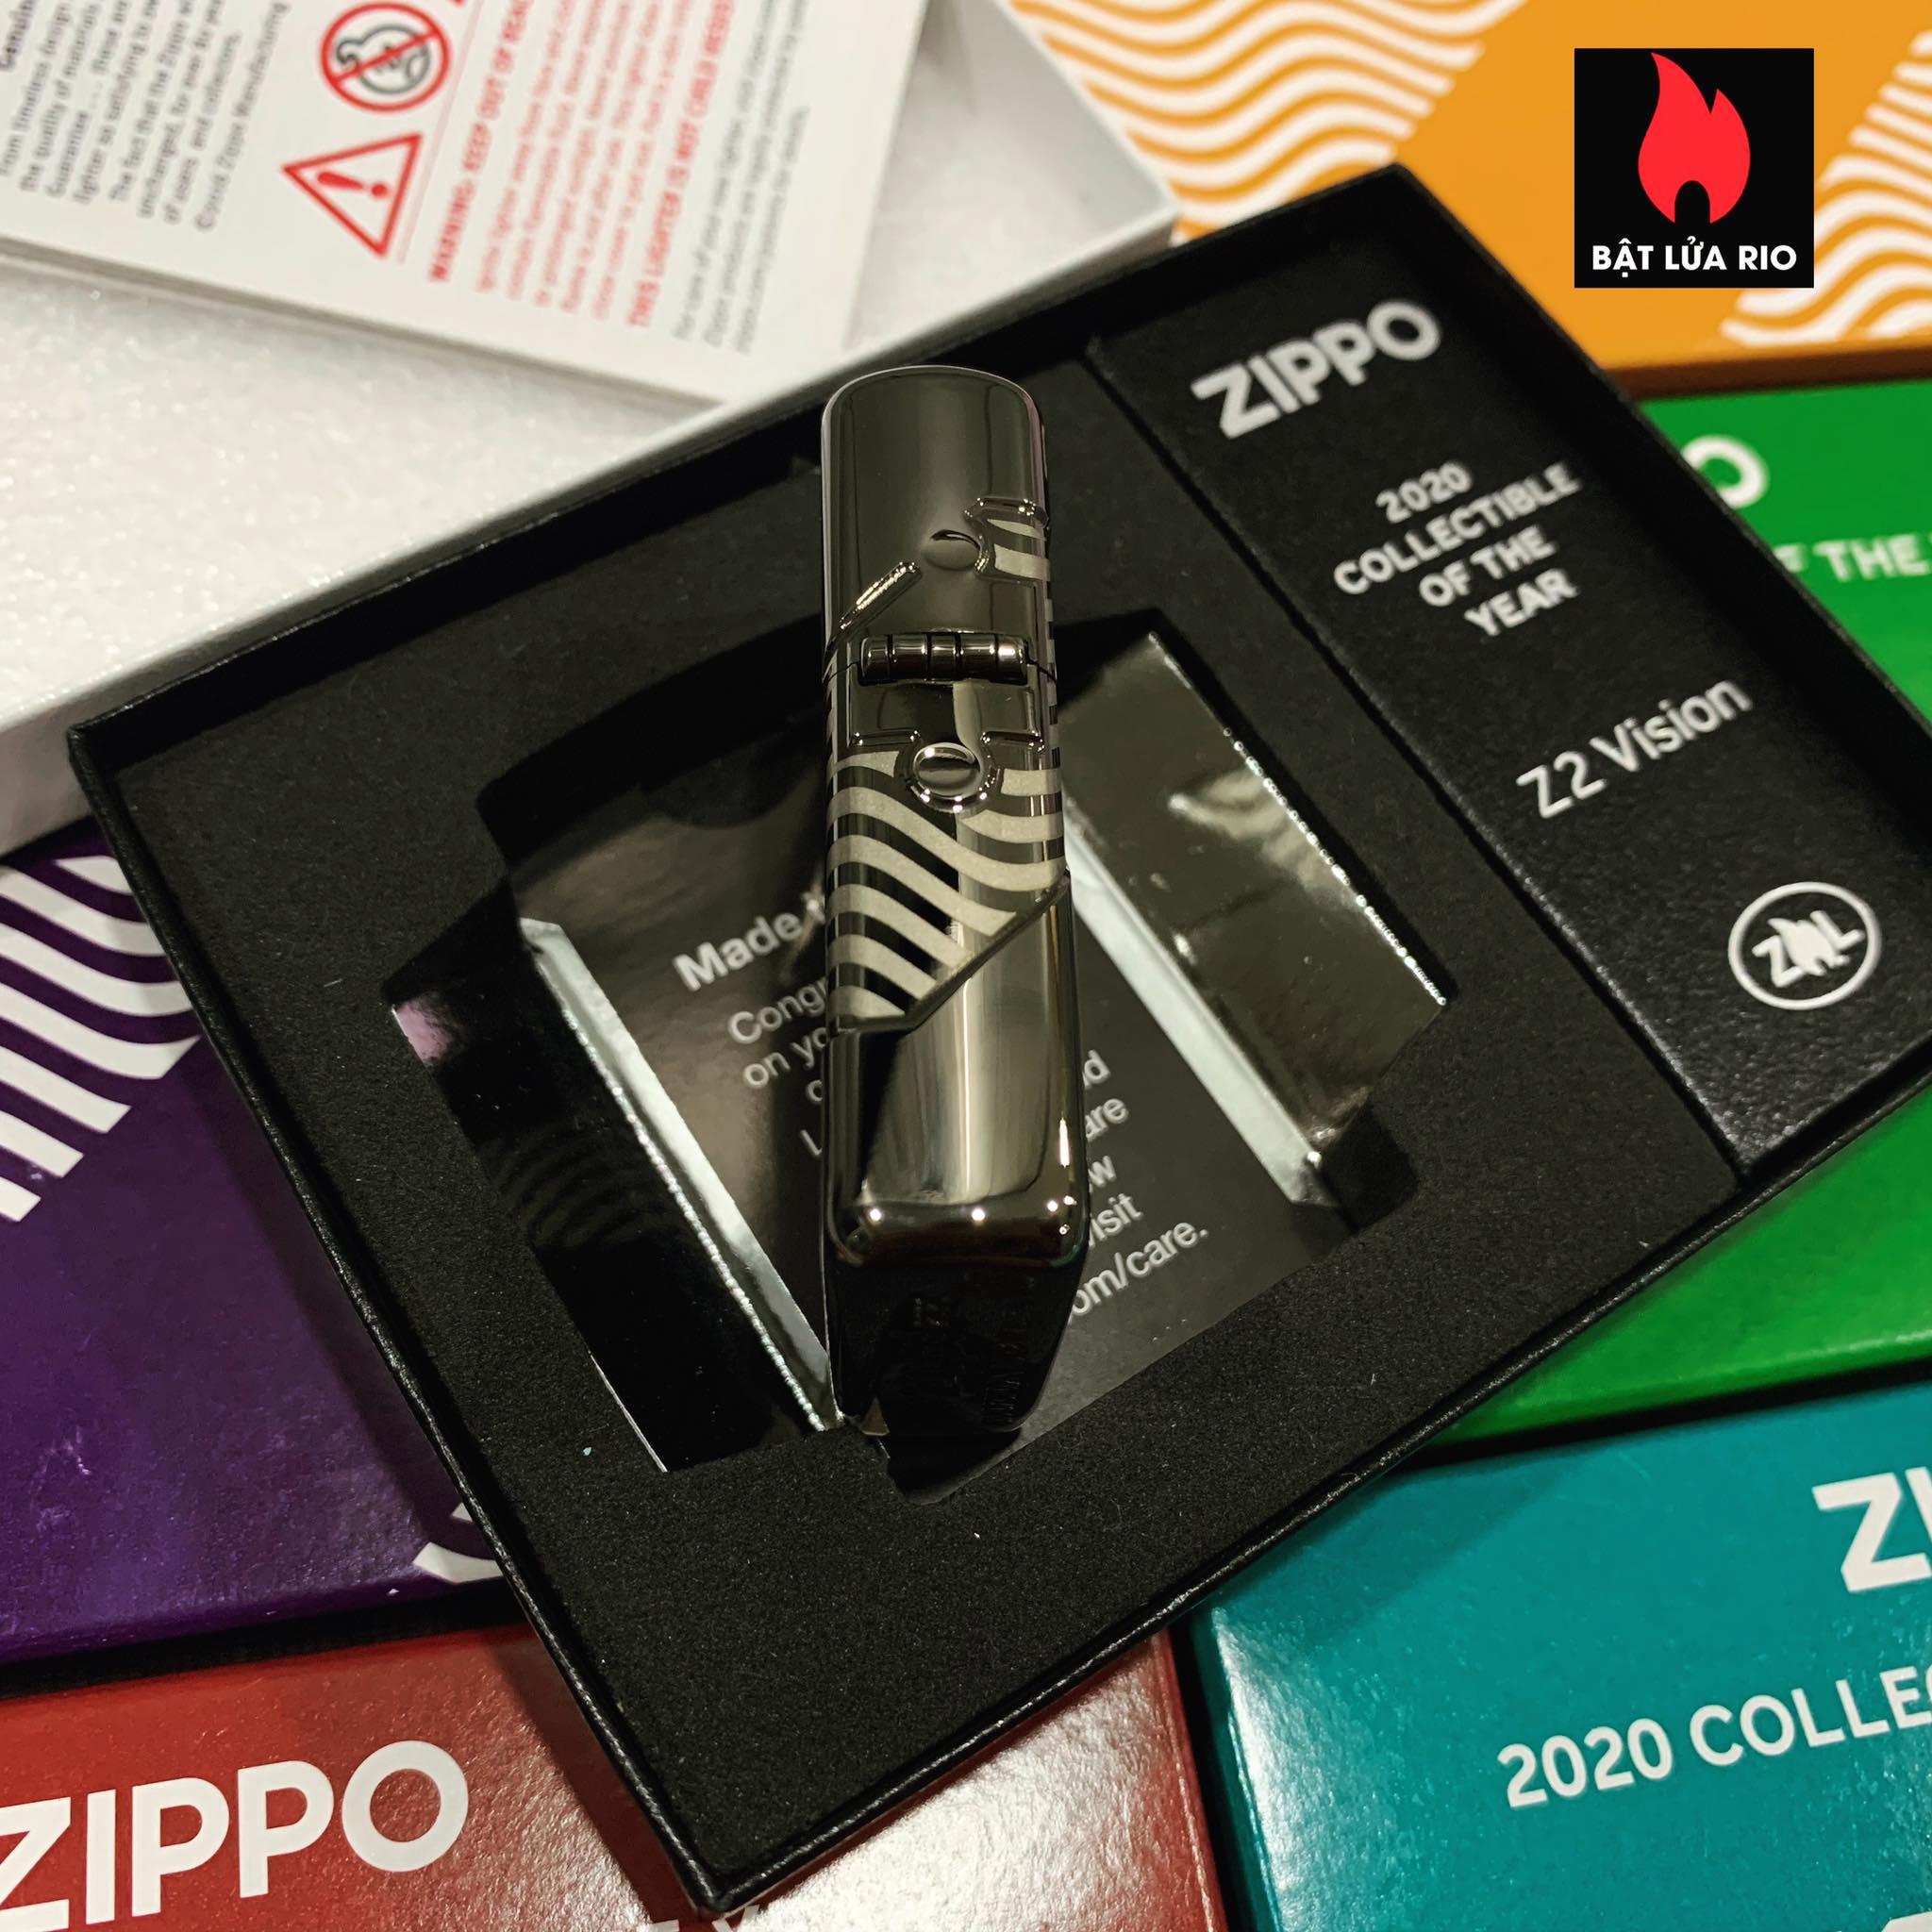 Zippo 49194 - Zippo 2020 Collectible Of The Year - Zippo Coty 2020 - Zippo Z2 Vision 25